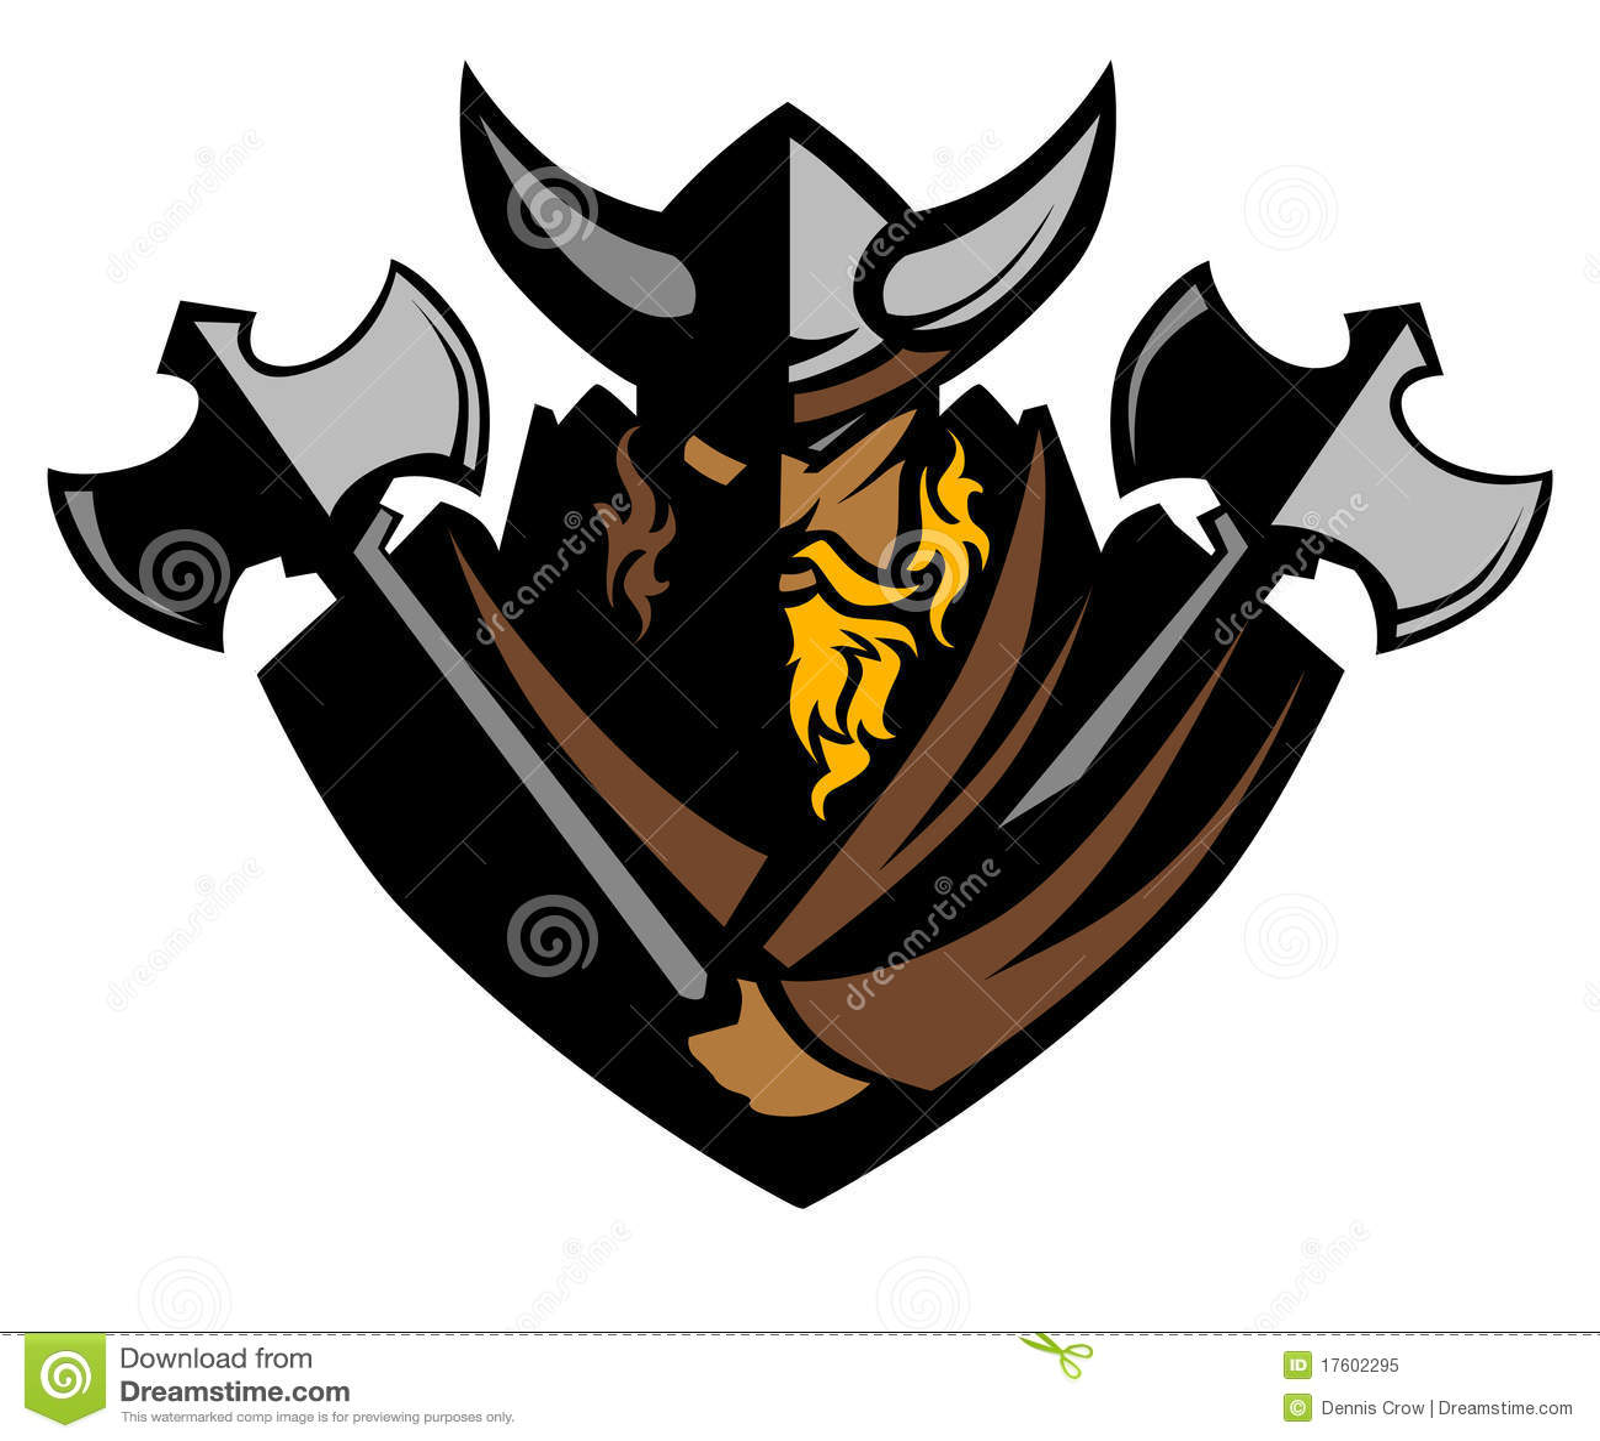 Vikingo/bárbaro con insignia de la mascota de las hachas